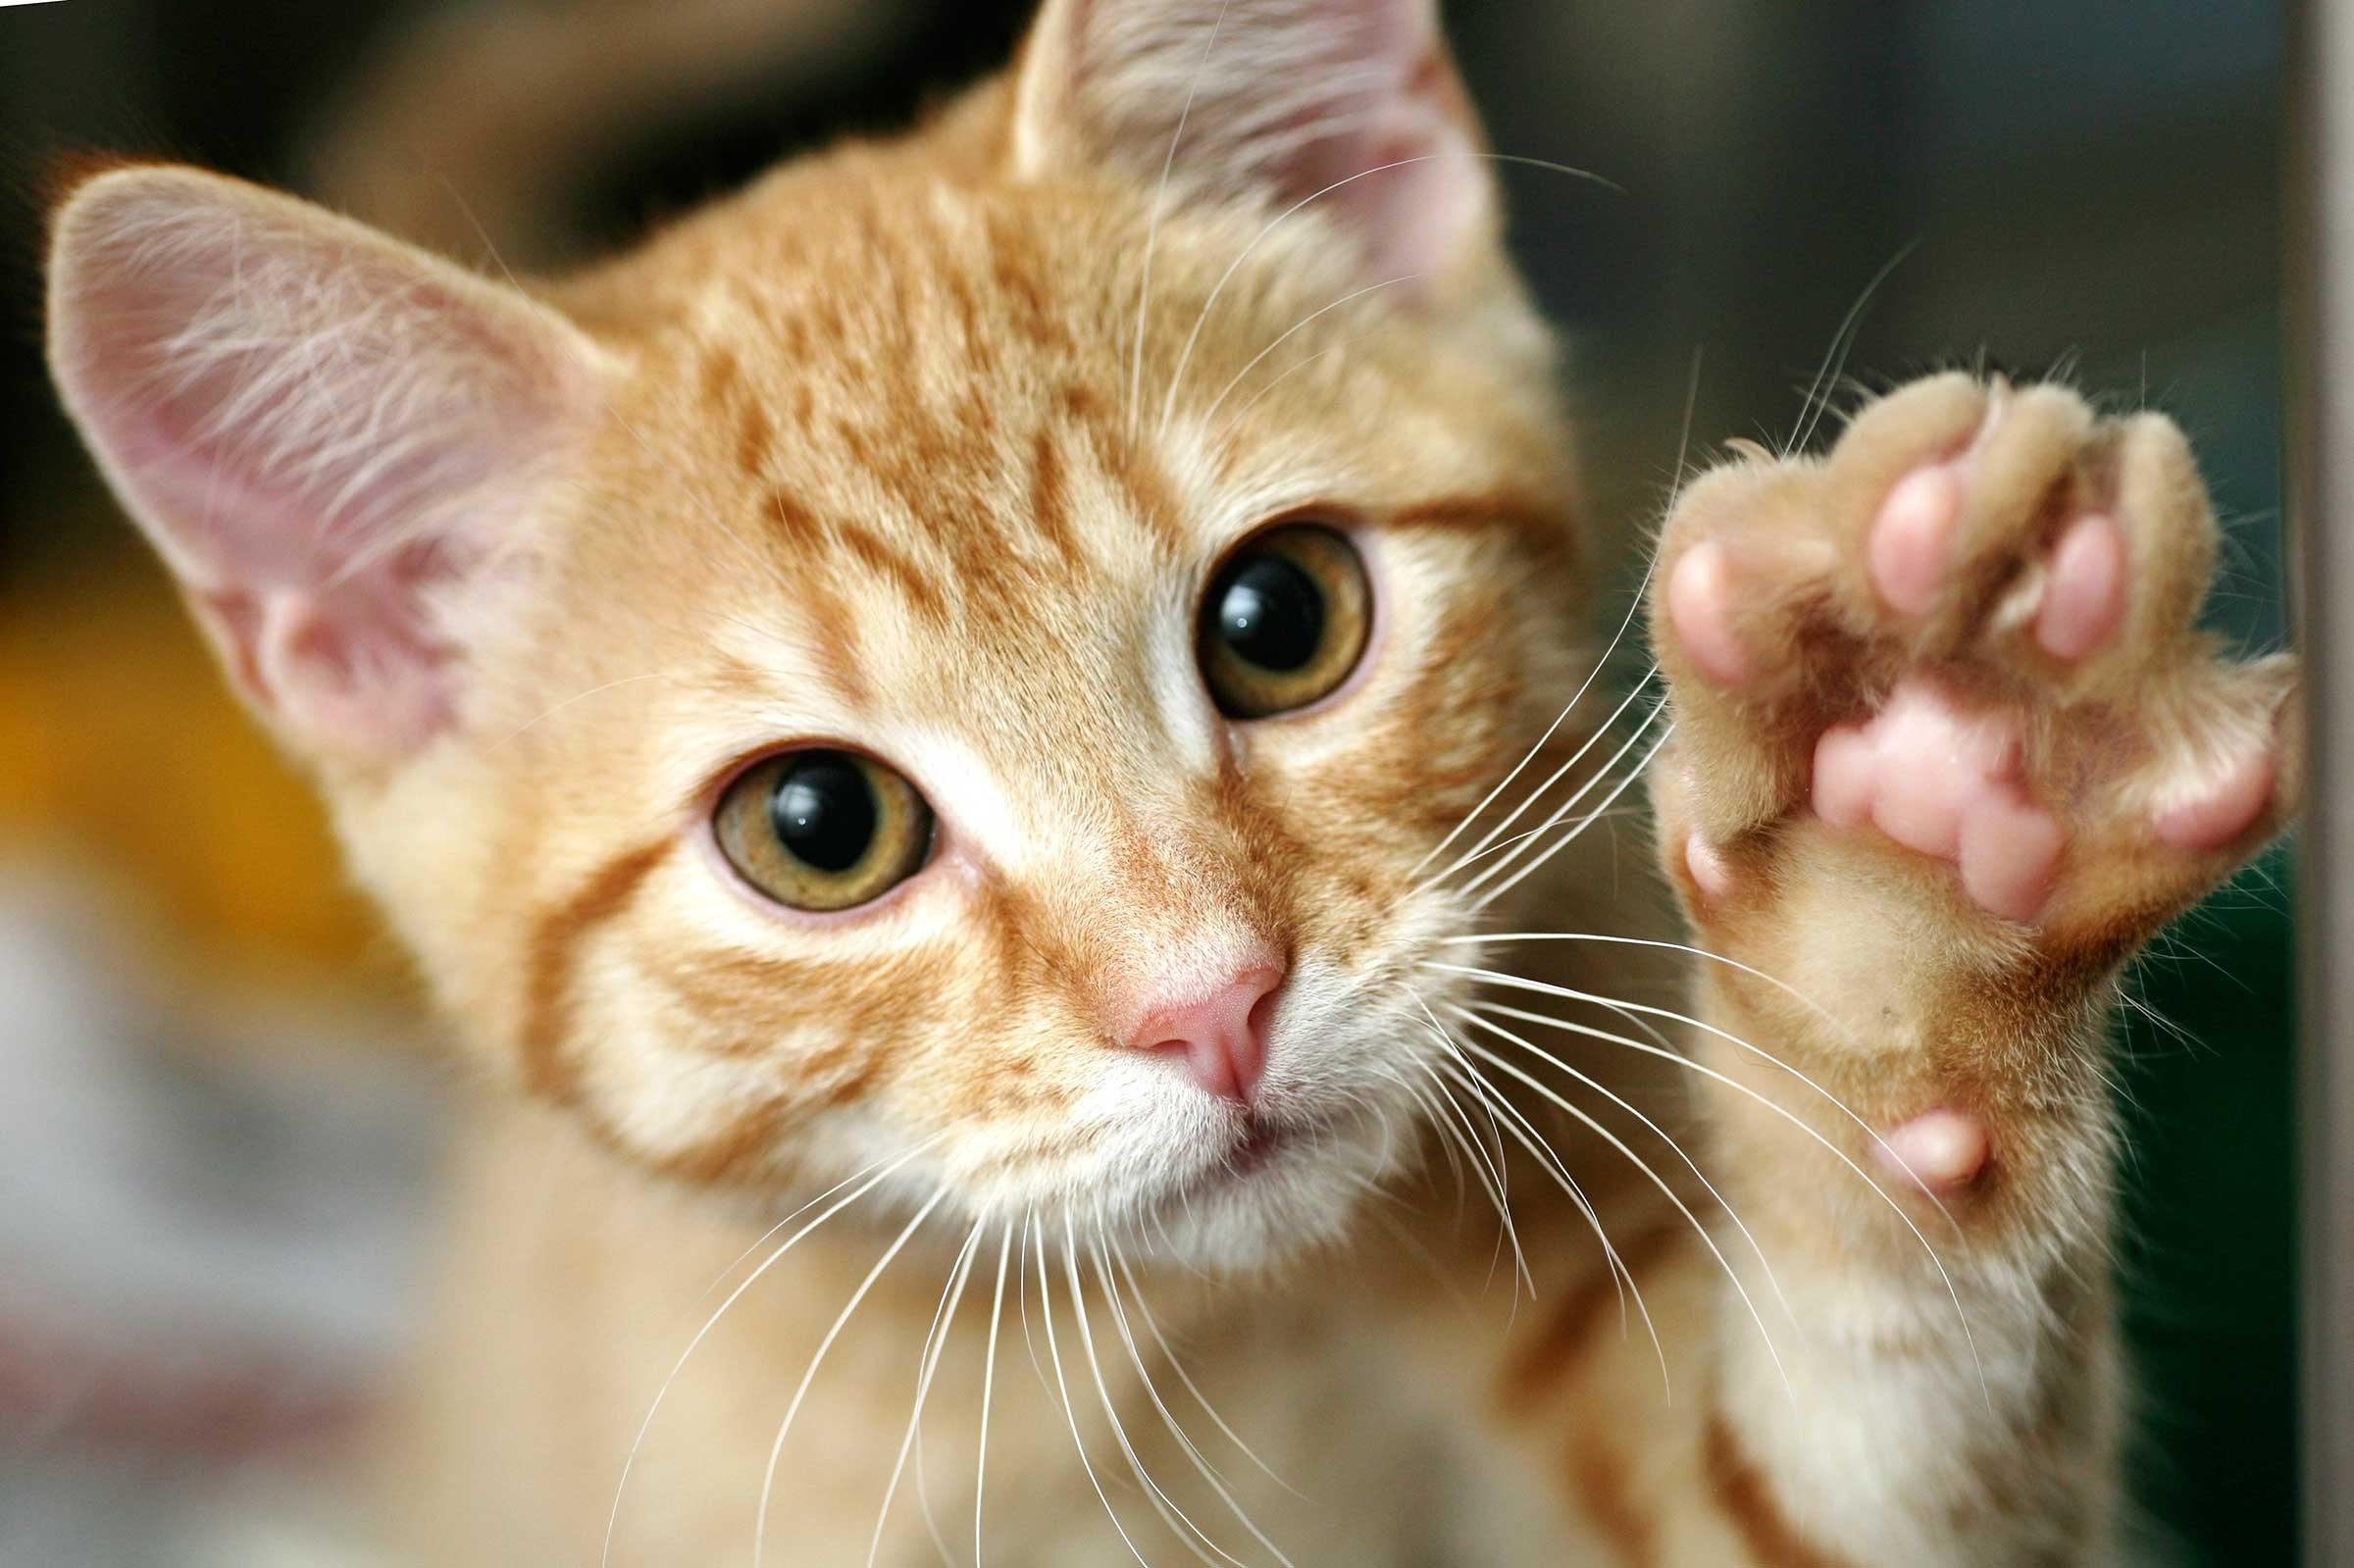 06 train cat shake hands.jpg?resize=1200,630 - 【話題】手術を受ける動物の横で支える猫の看護師!